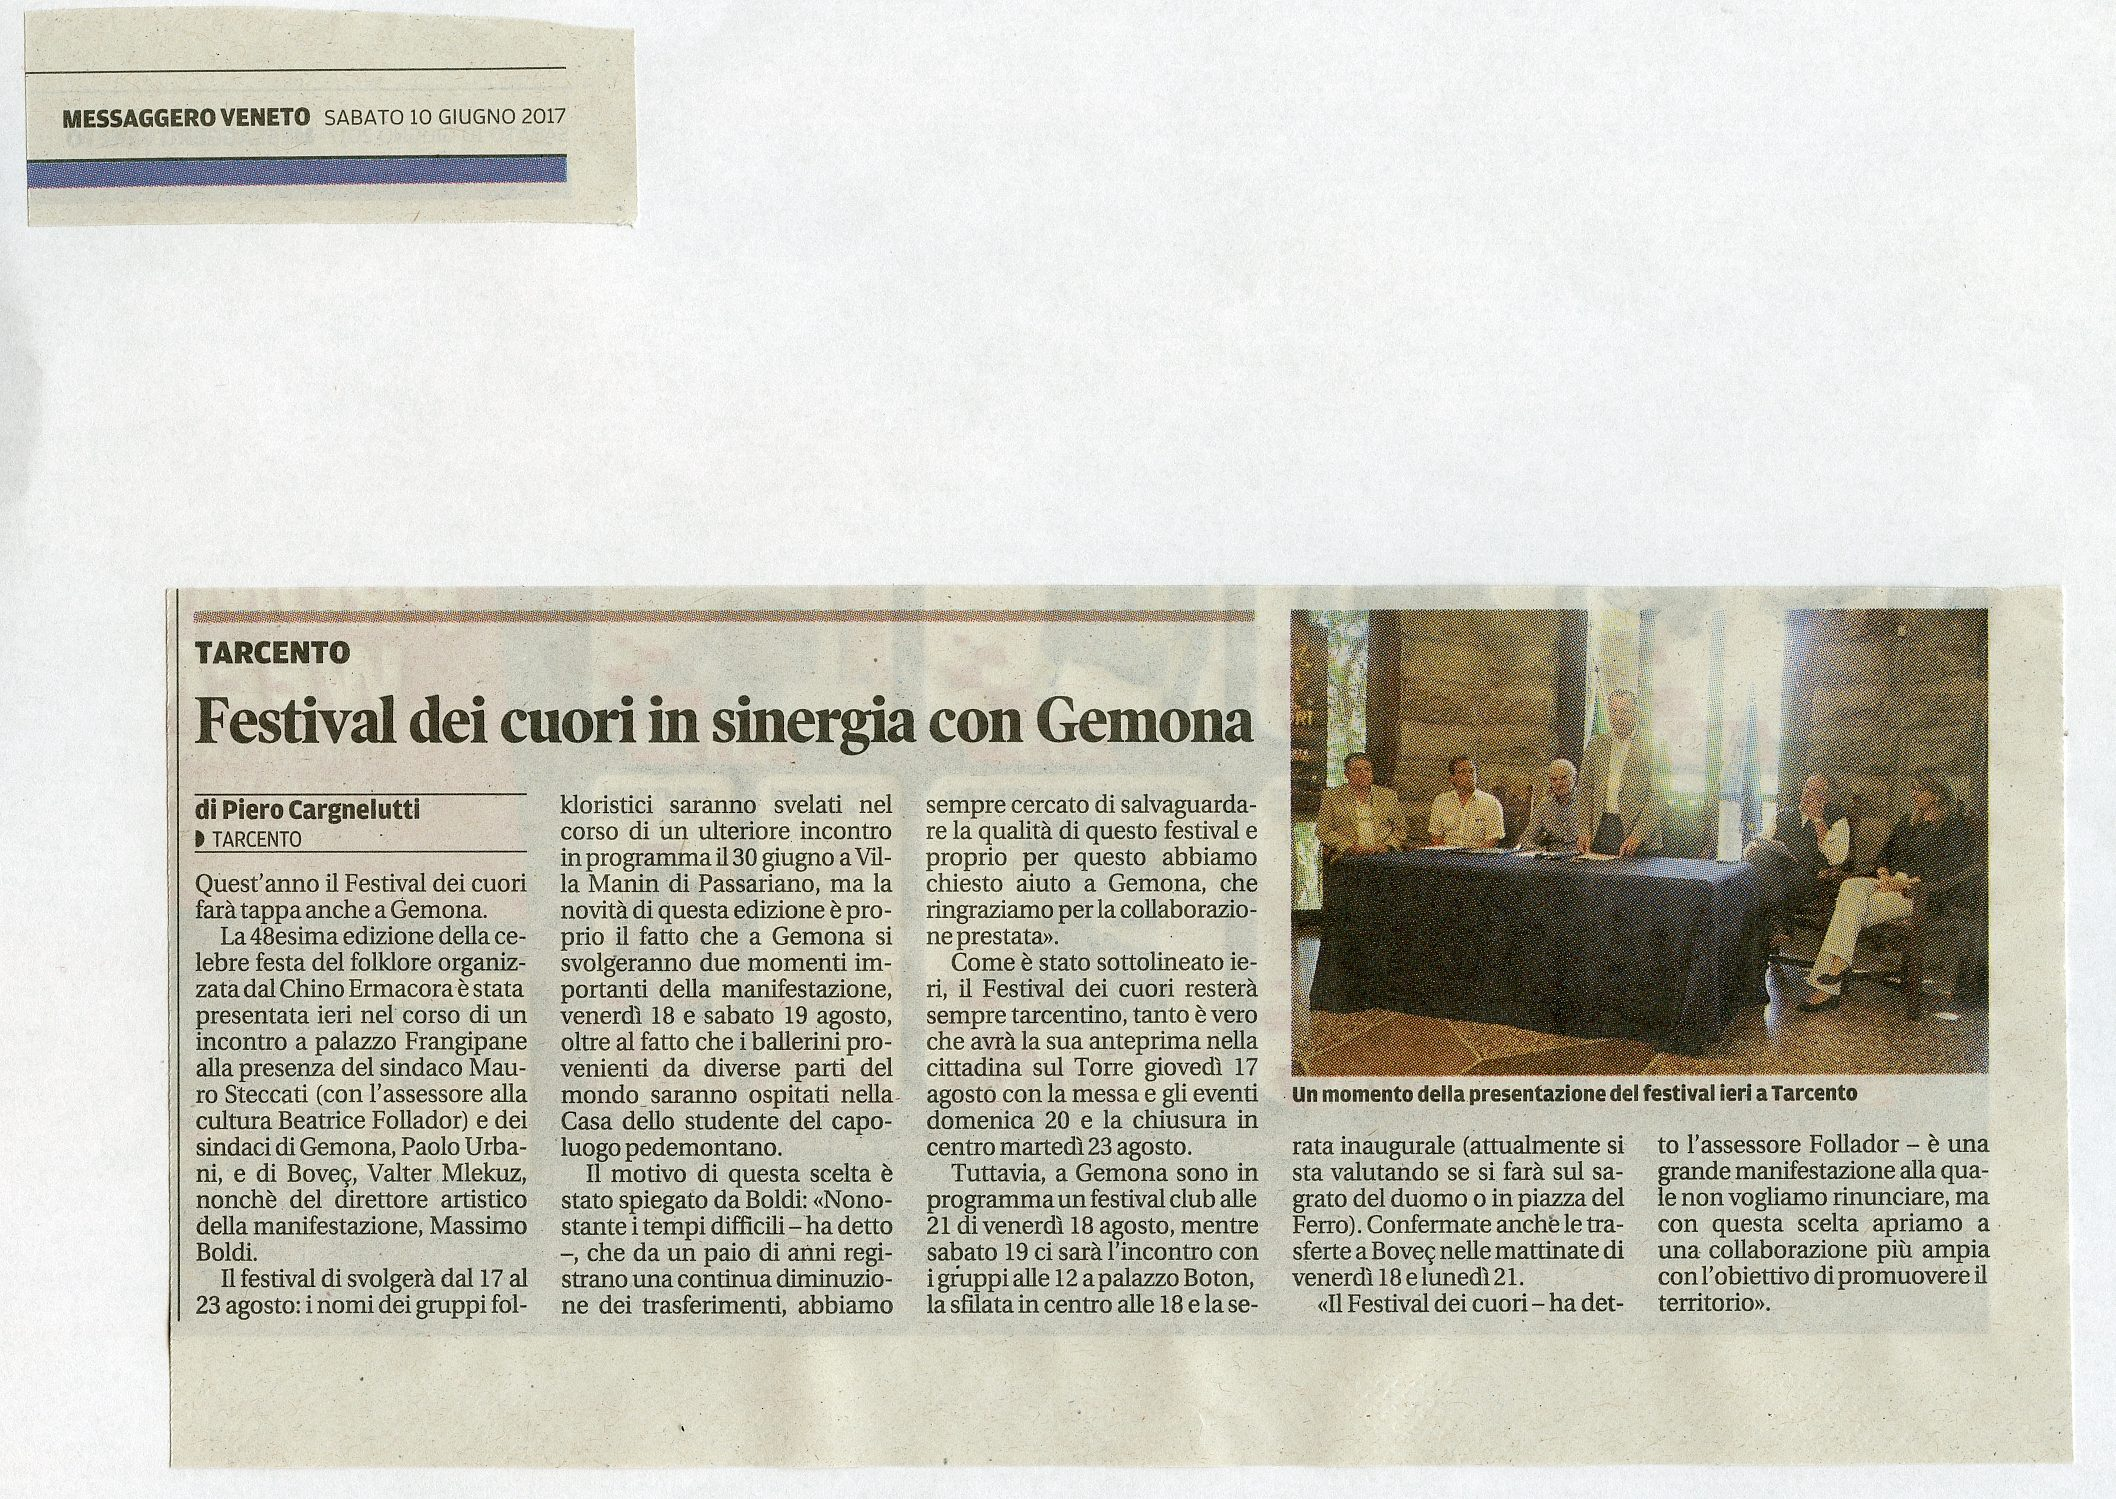 Messaggero Veneto 10.06.2017